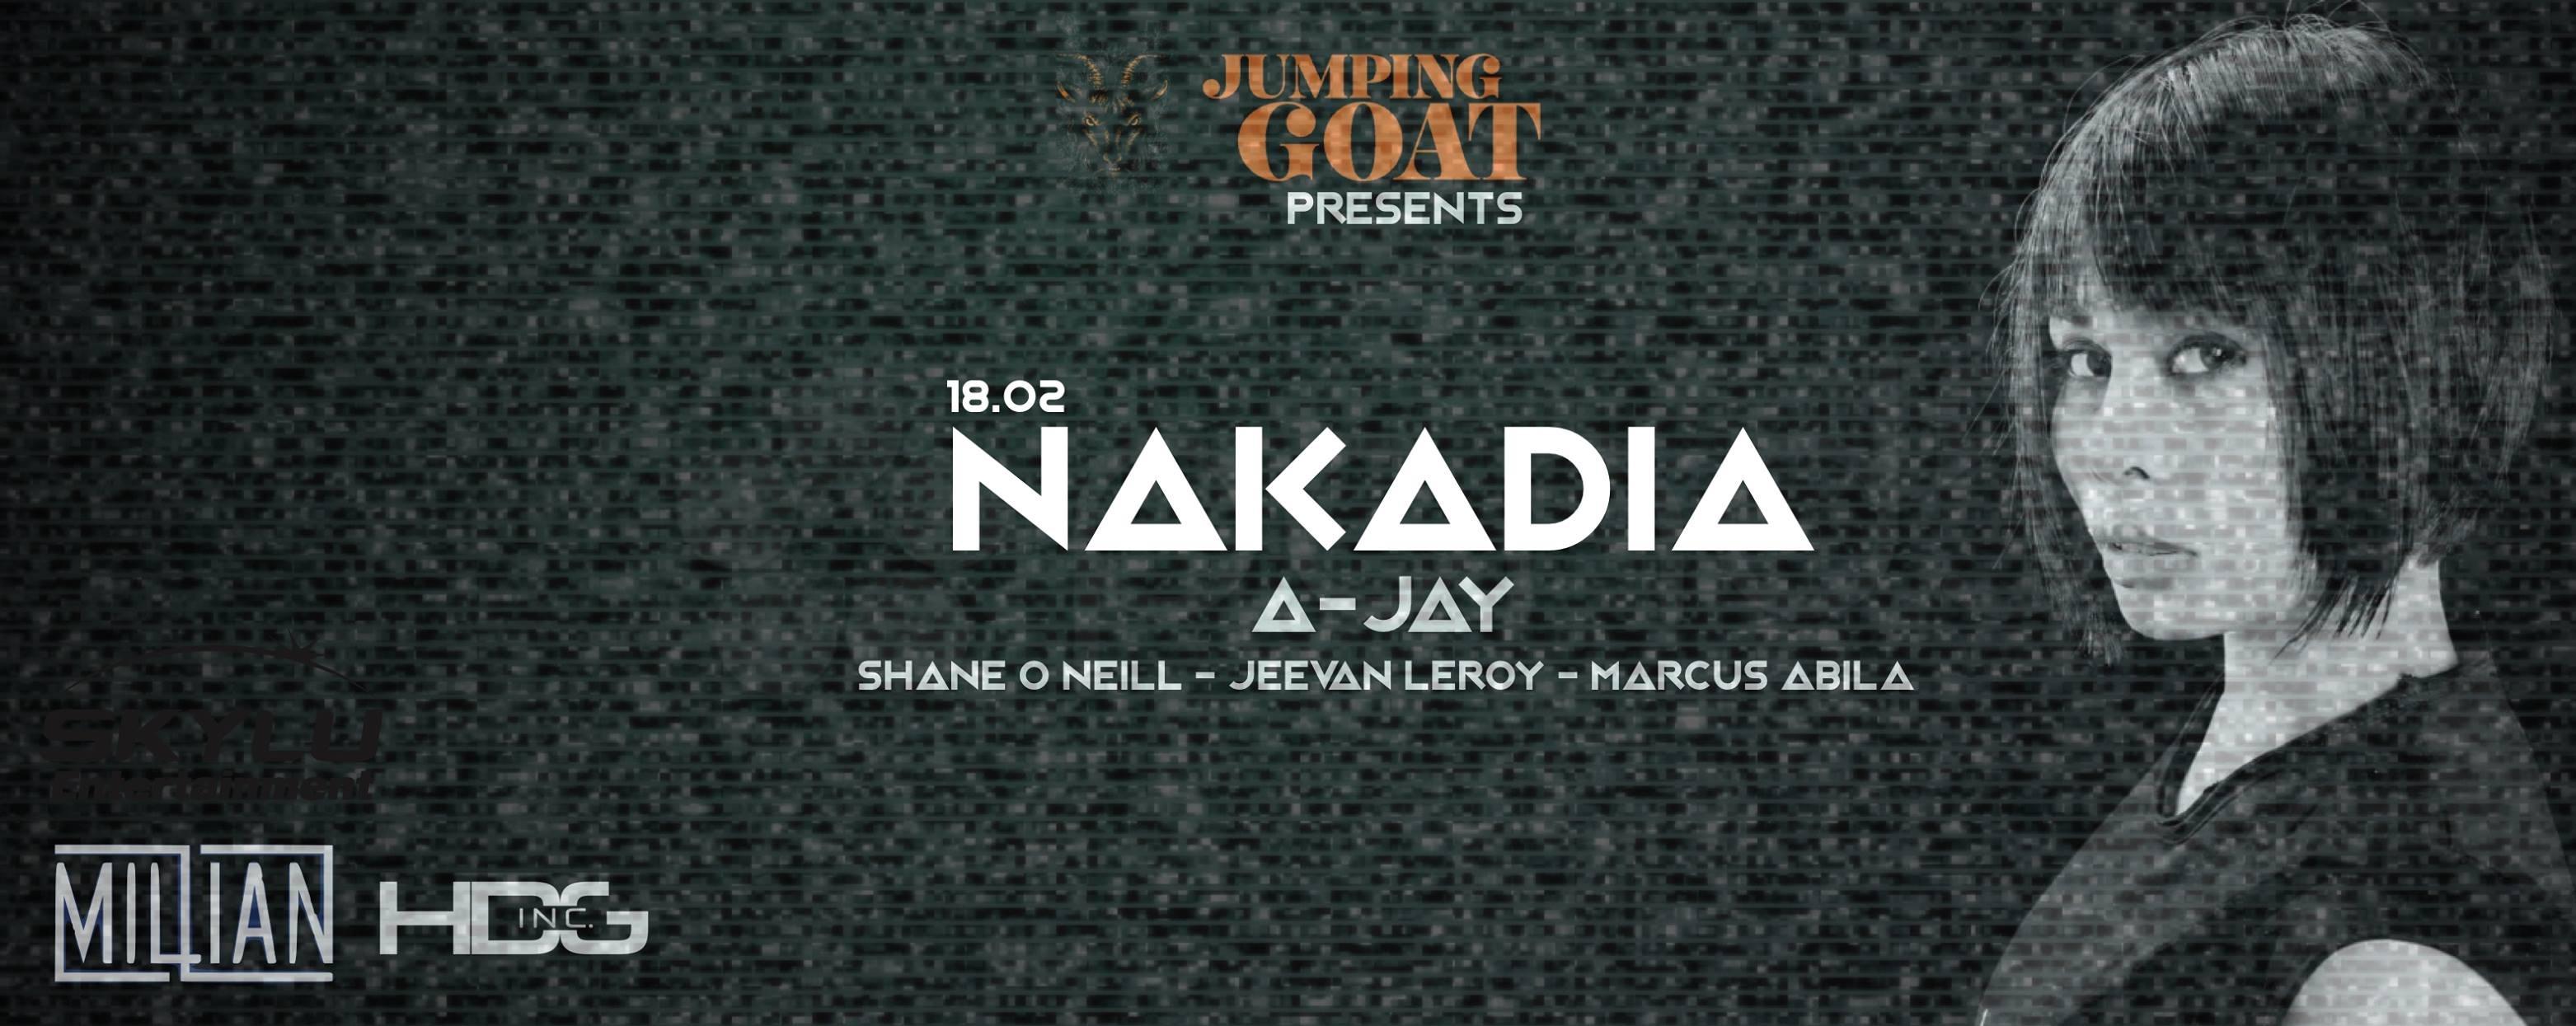 Jumping Goat Presents Nakadia